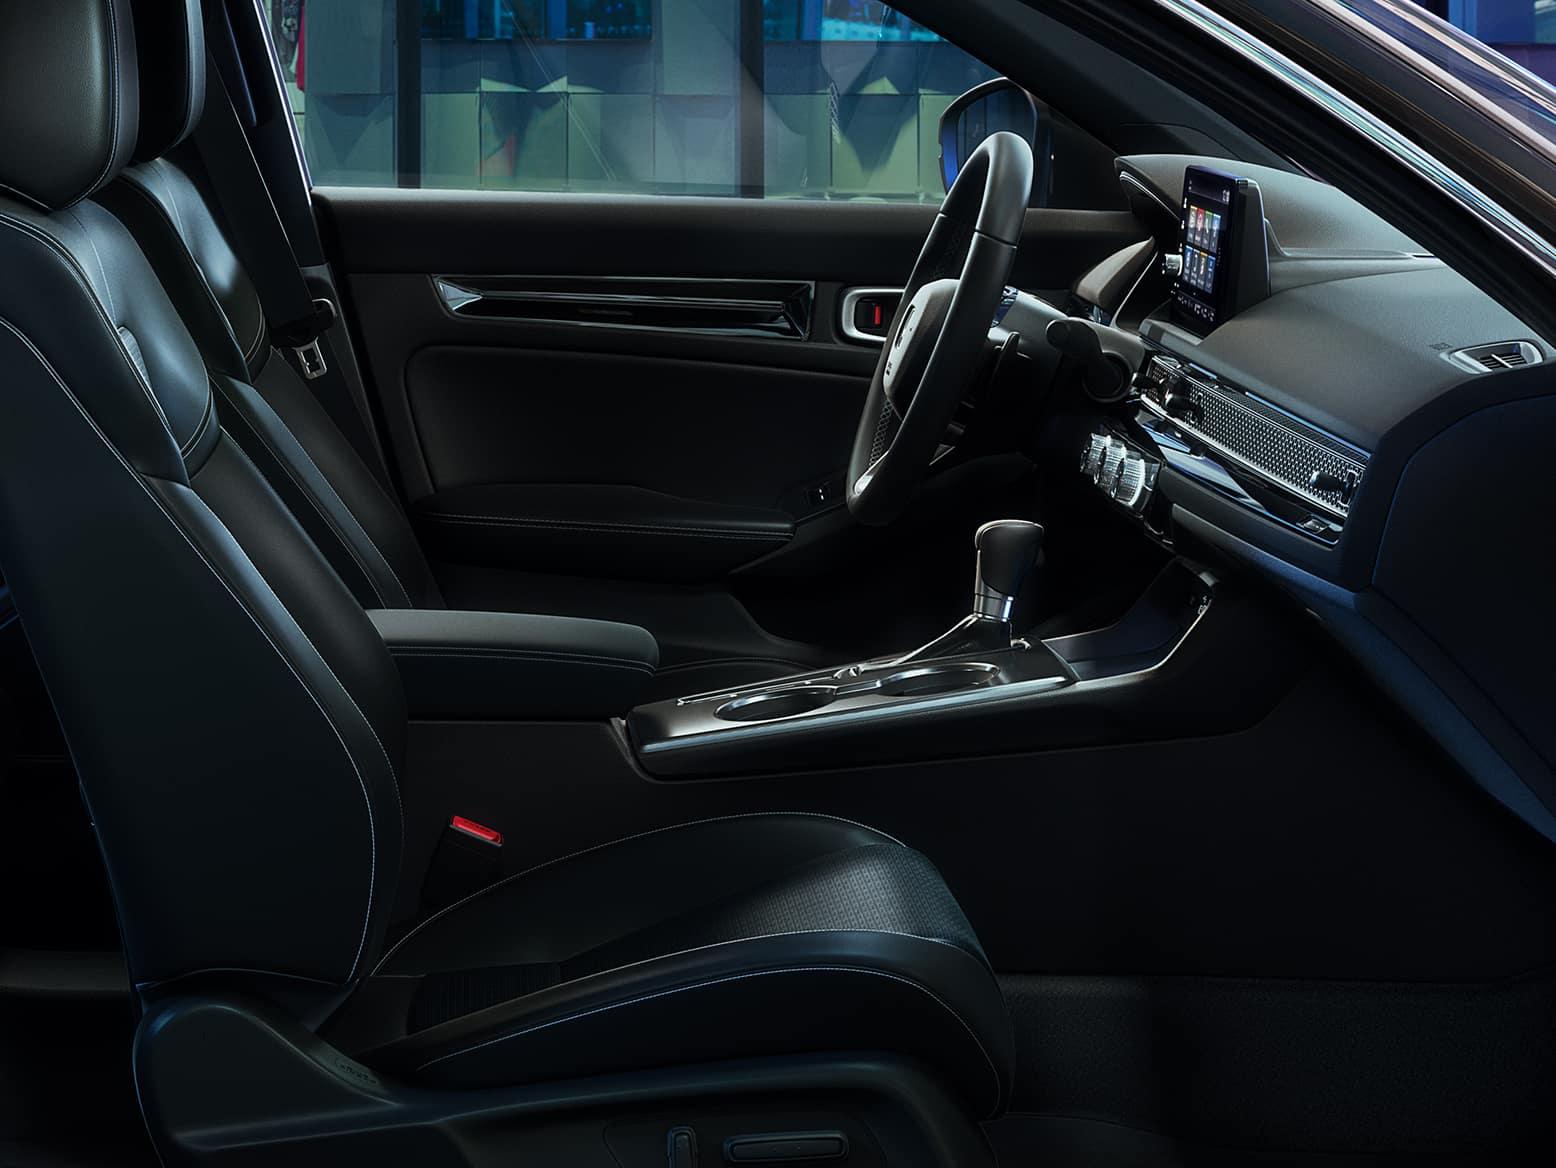 2022 Honda Civic hatchback with heated seats